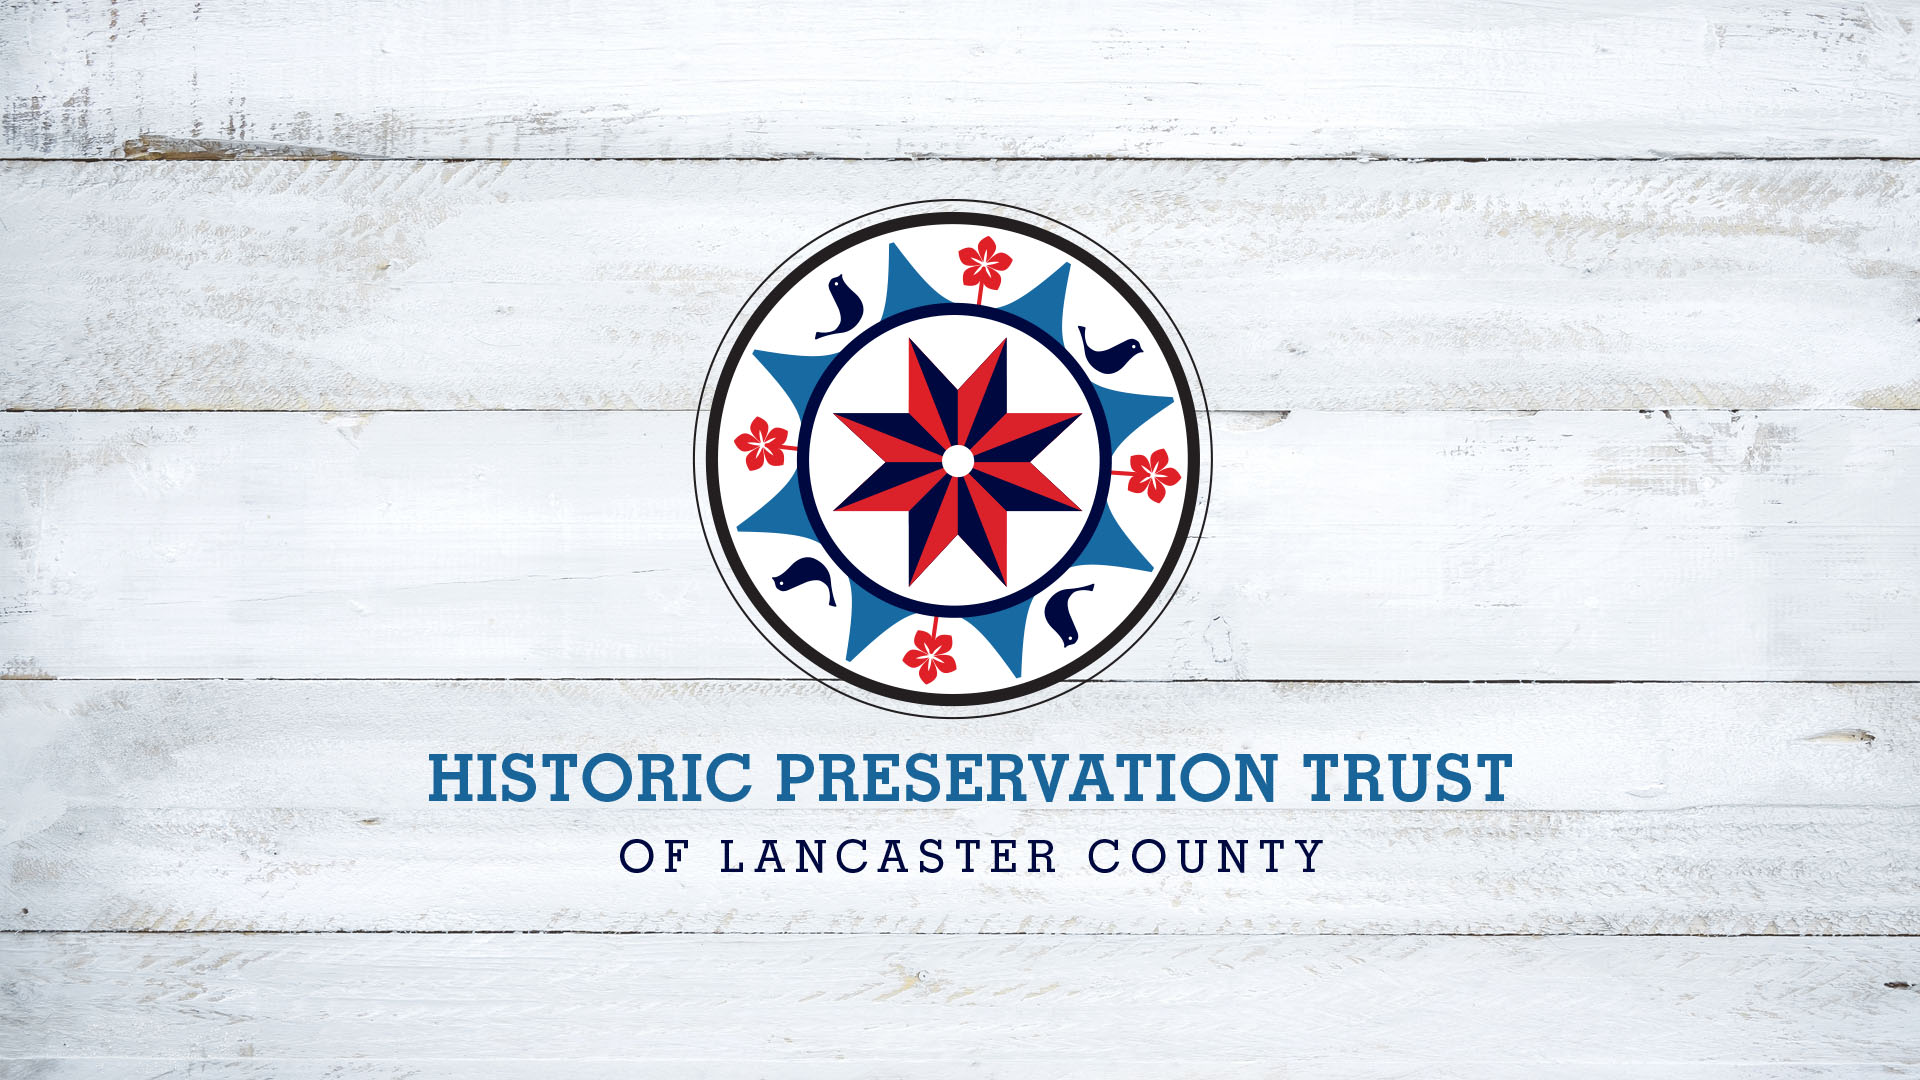 HISTORIC PRESERVATION TRUST BRAND IDENTITY